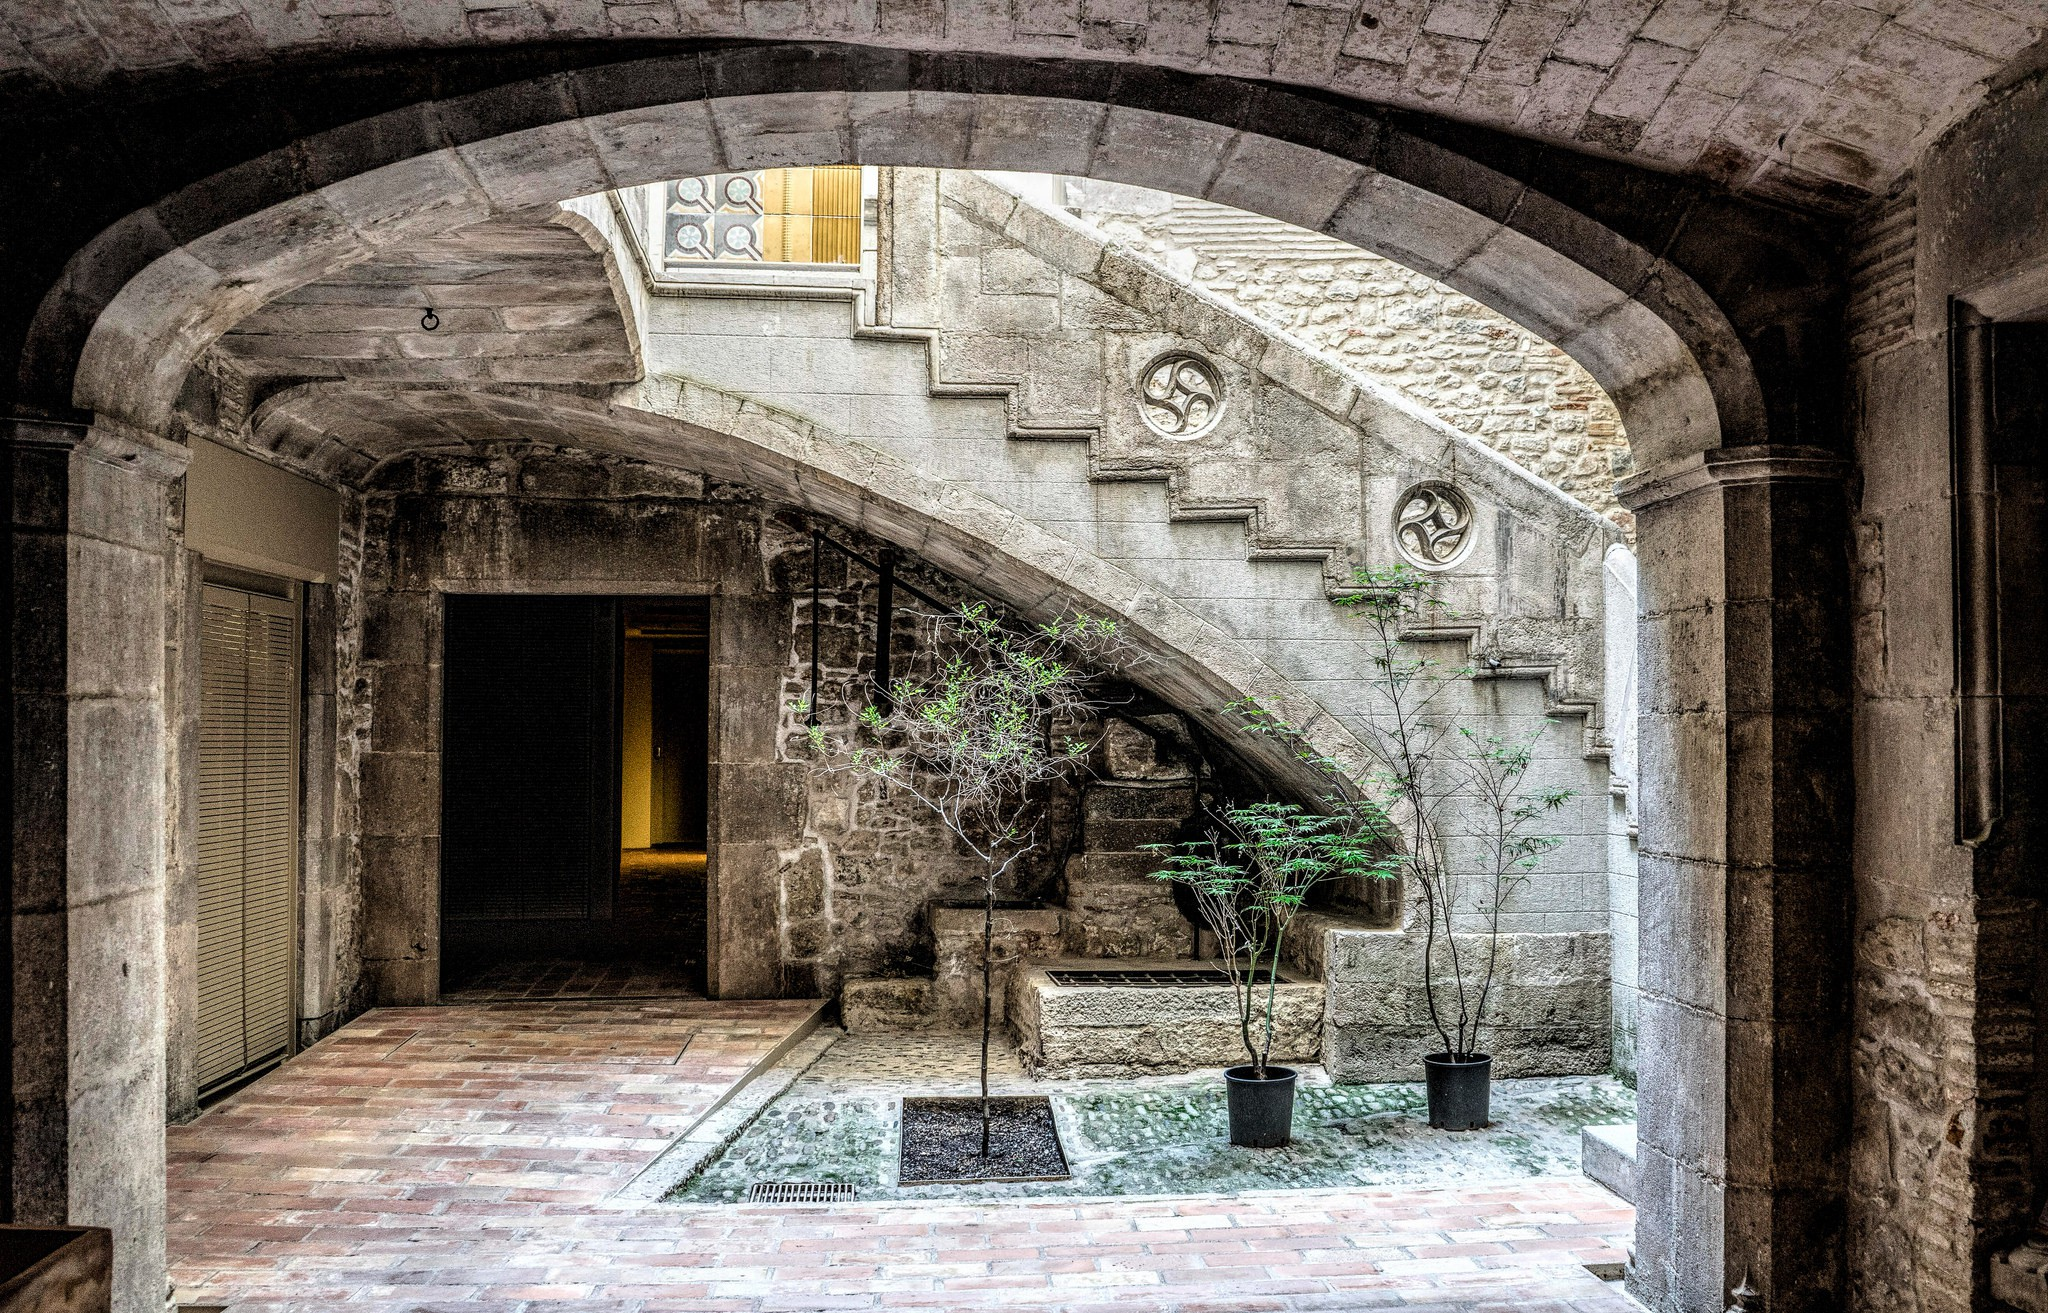 Jewish Quarter in Girona, Spain | © Enric  Rubio Ros / Flickr